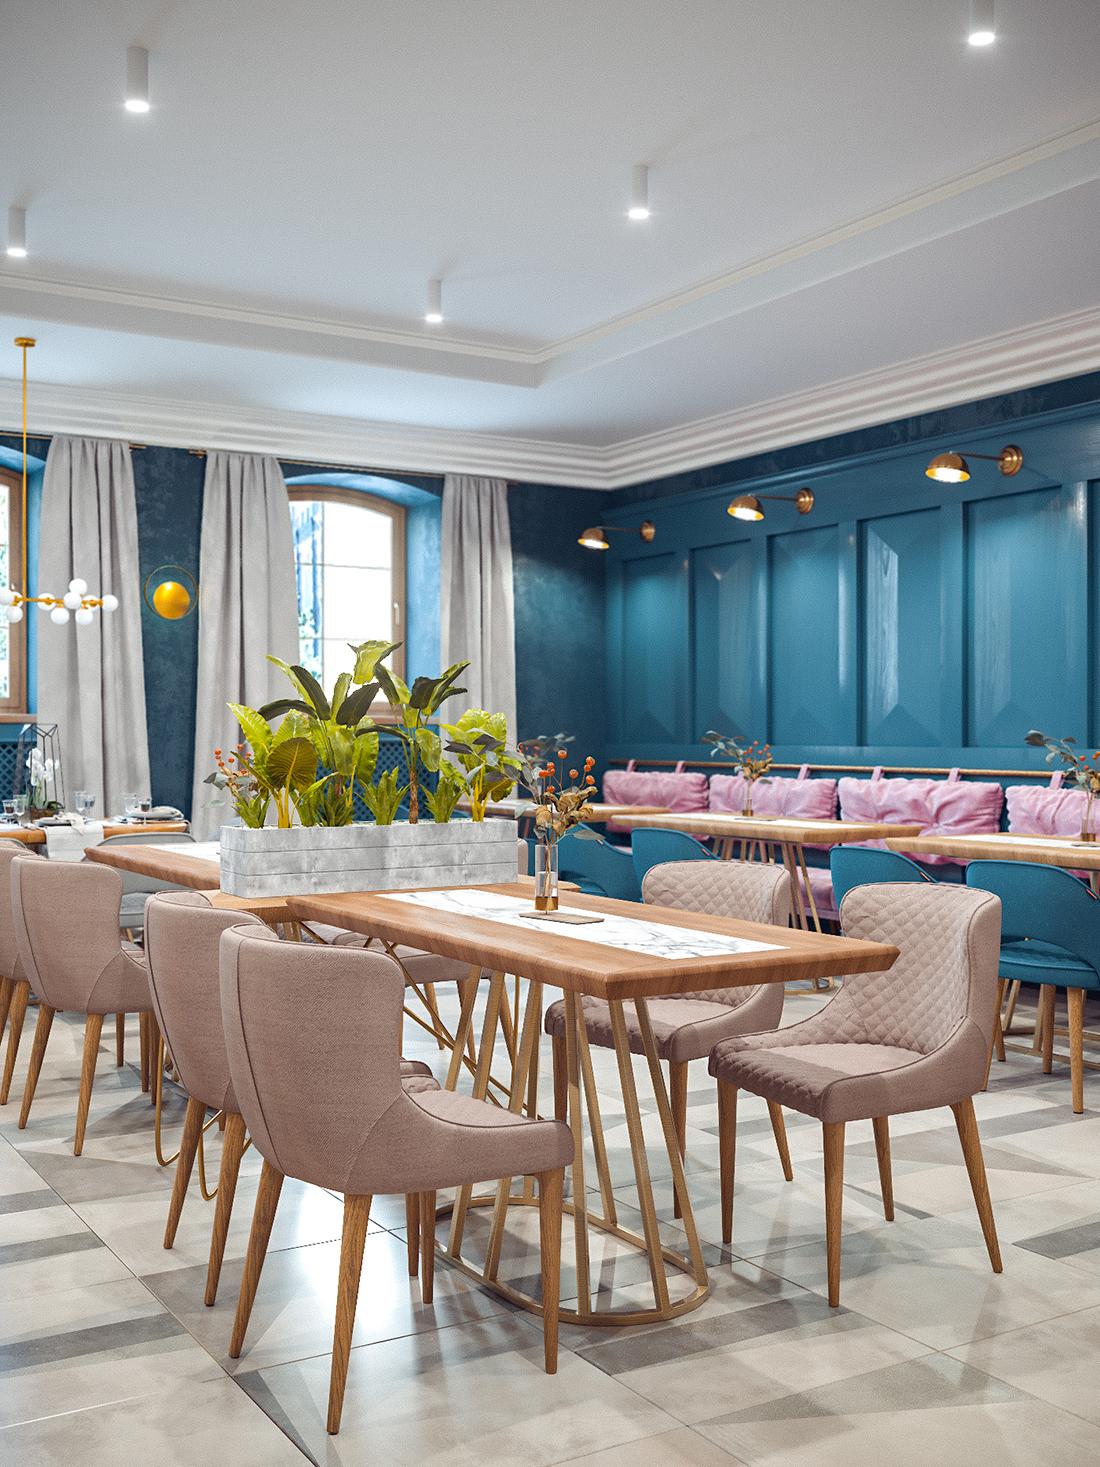 Hotel restaurant | concept